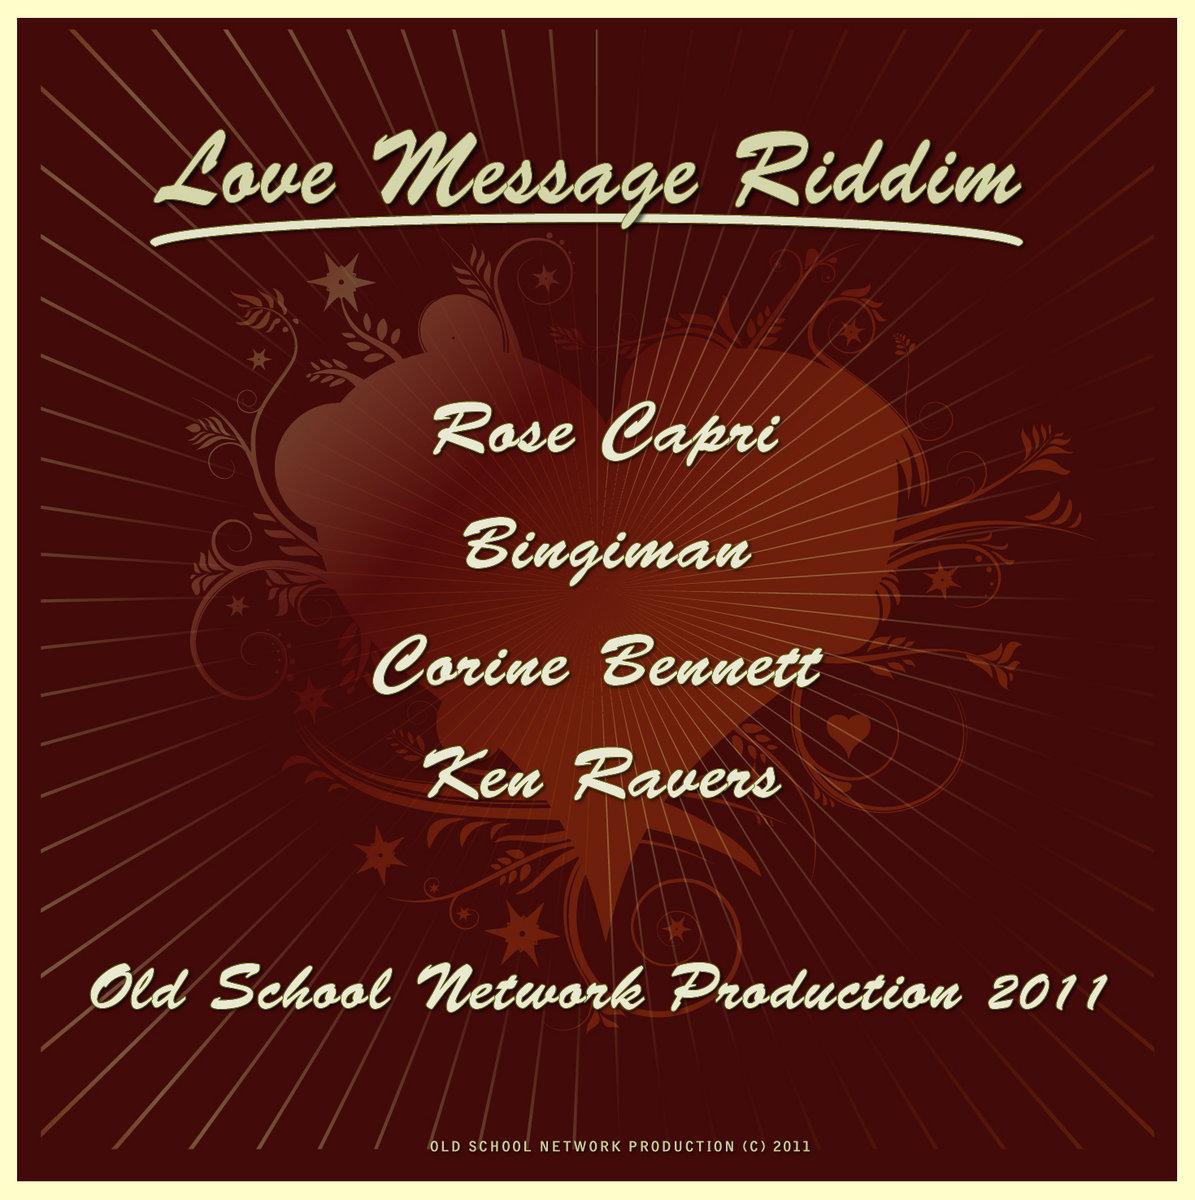 Love Message Riddim Bingiman